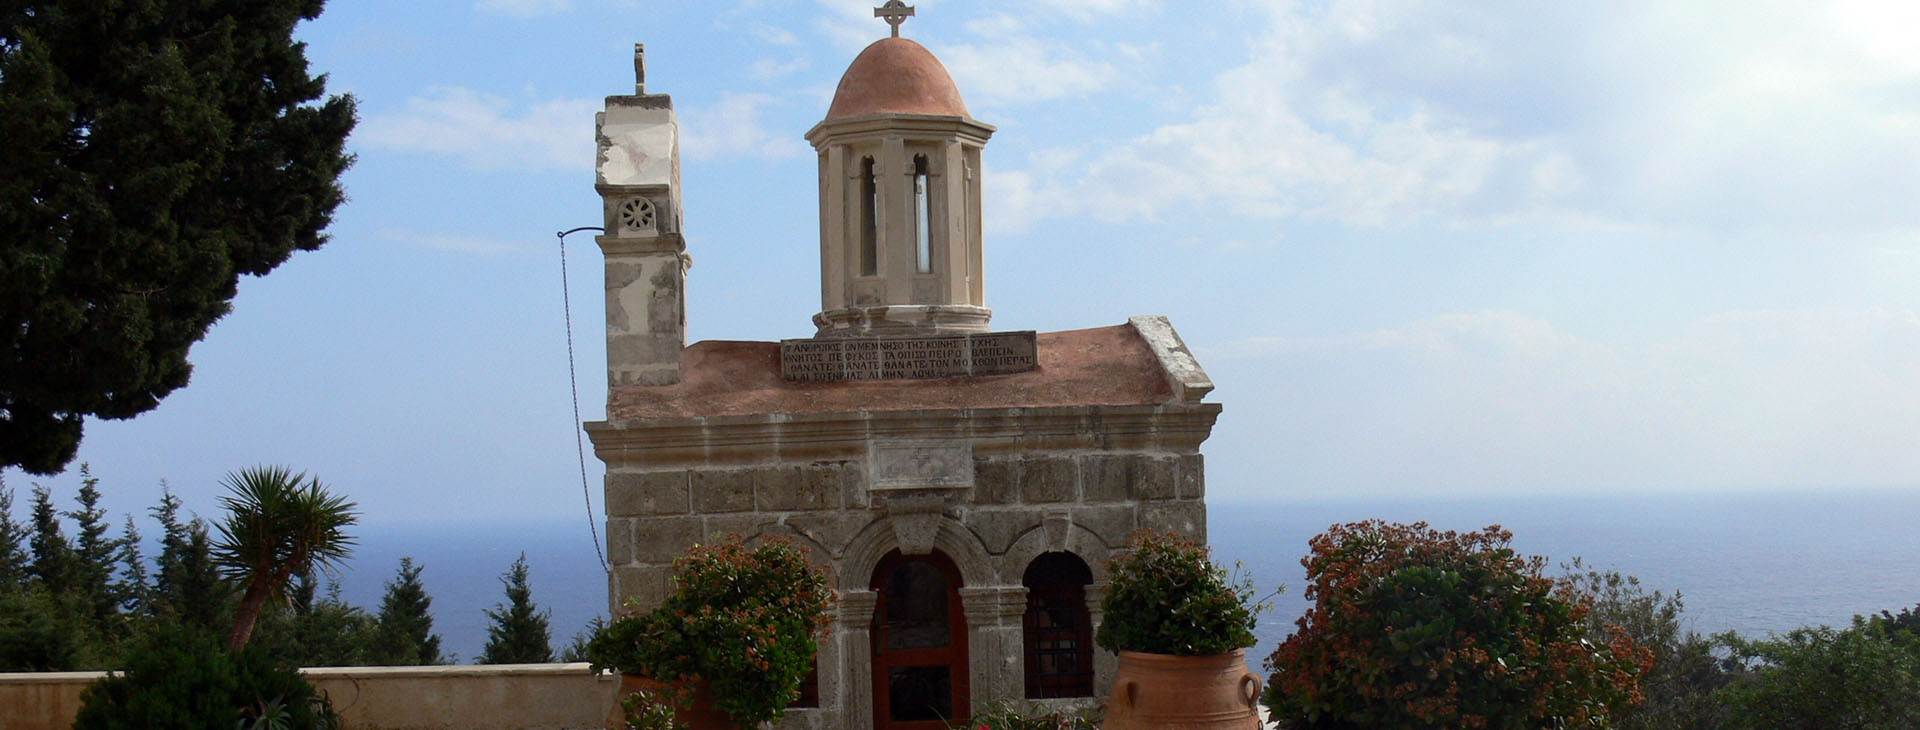 Preveli Monastery, Rethymnon